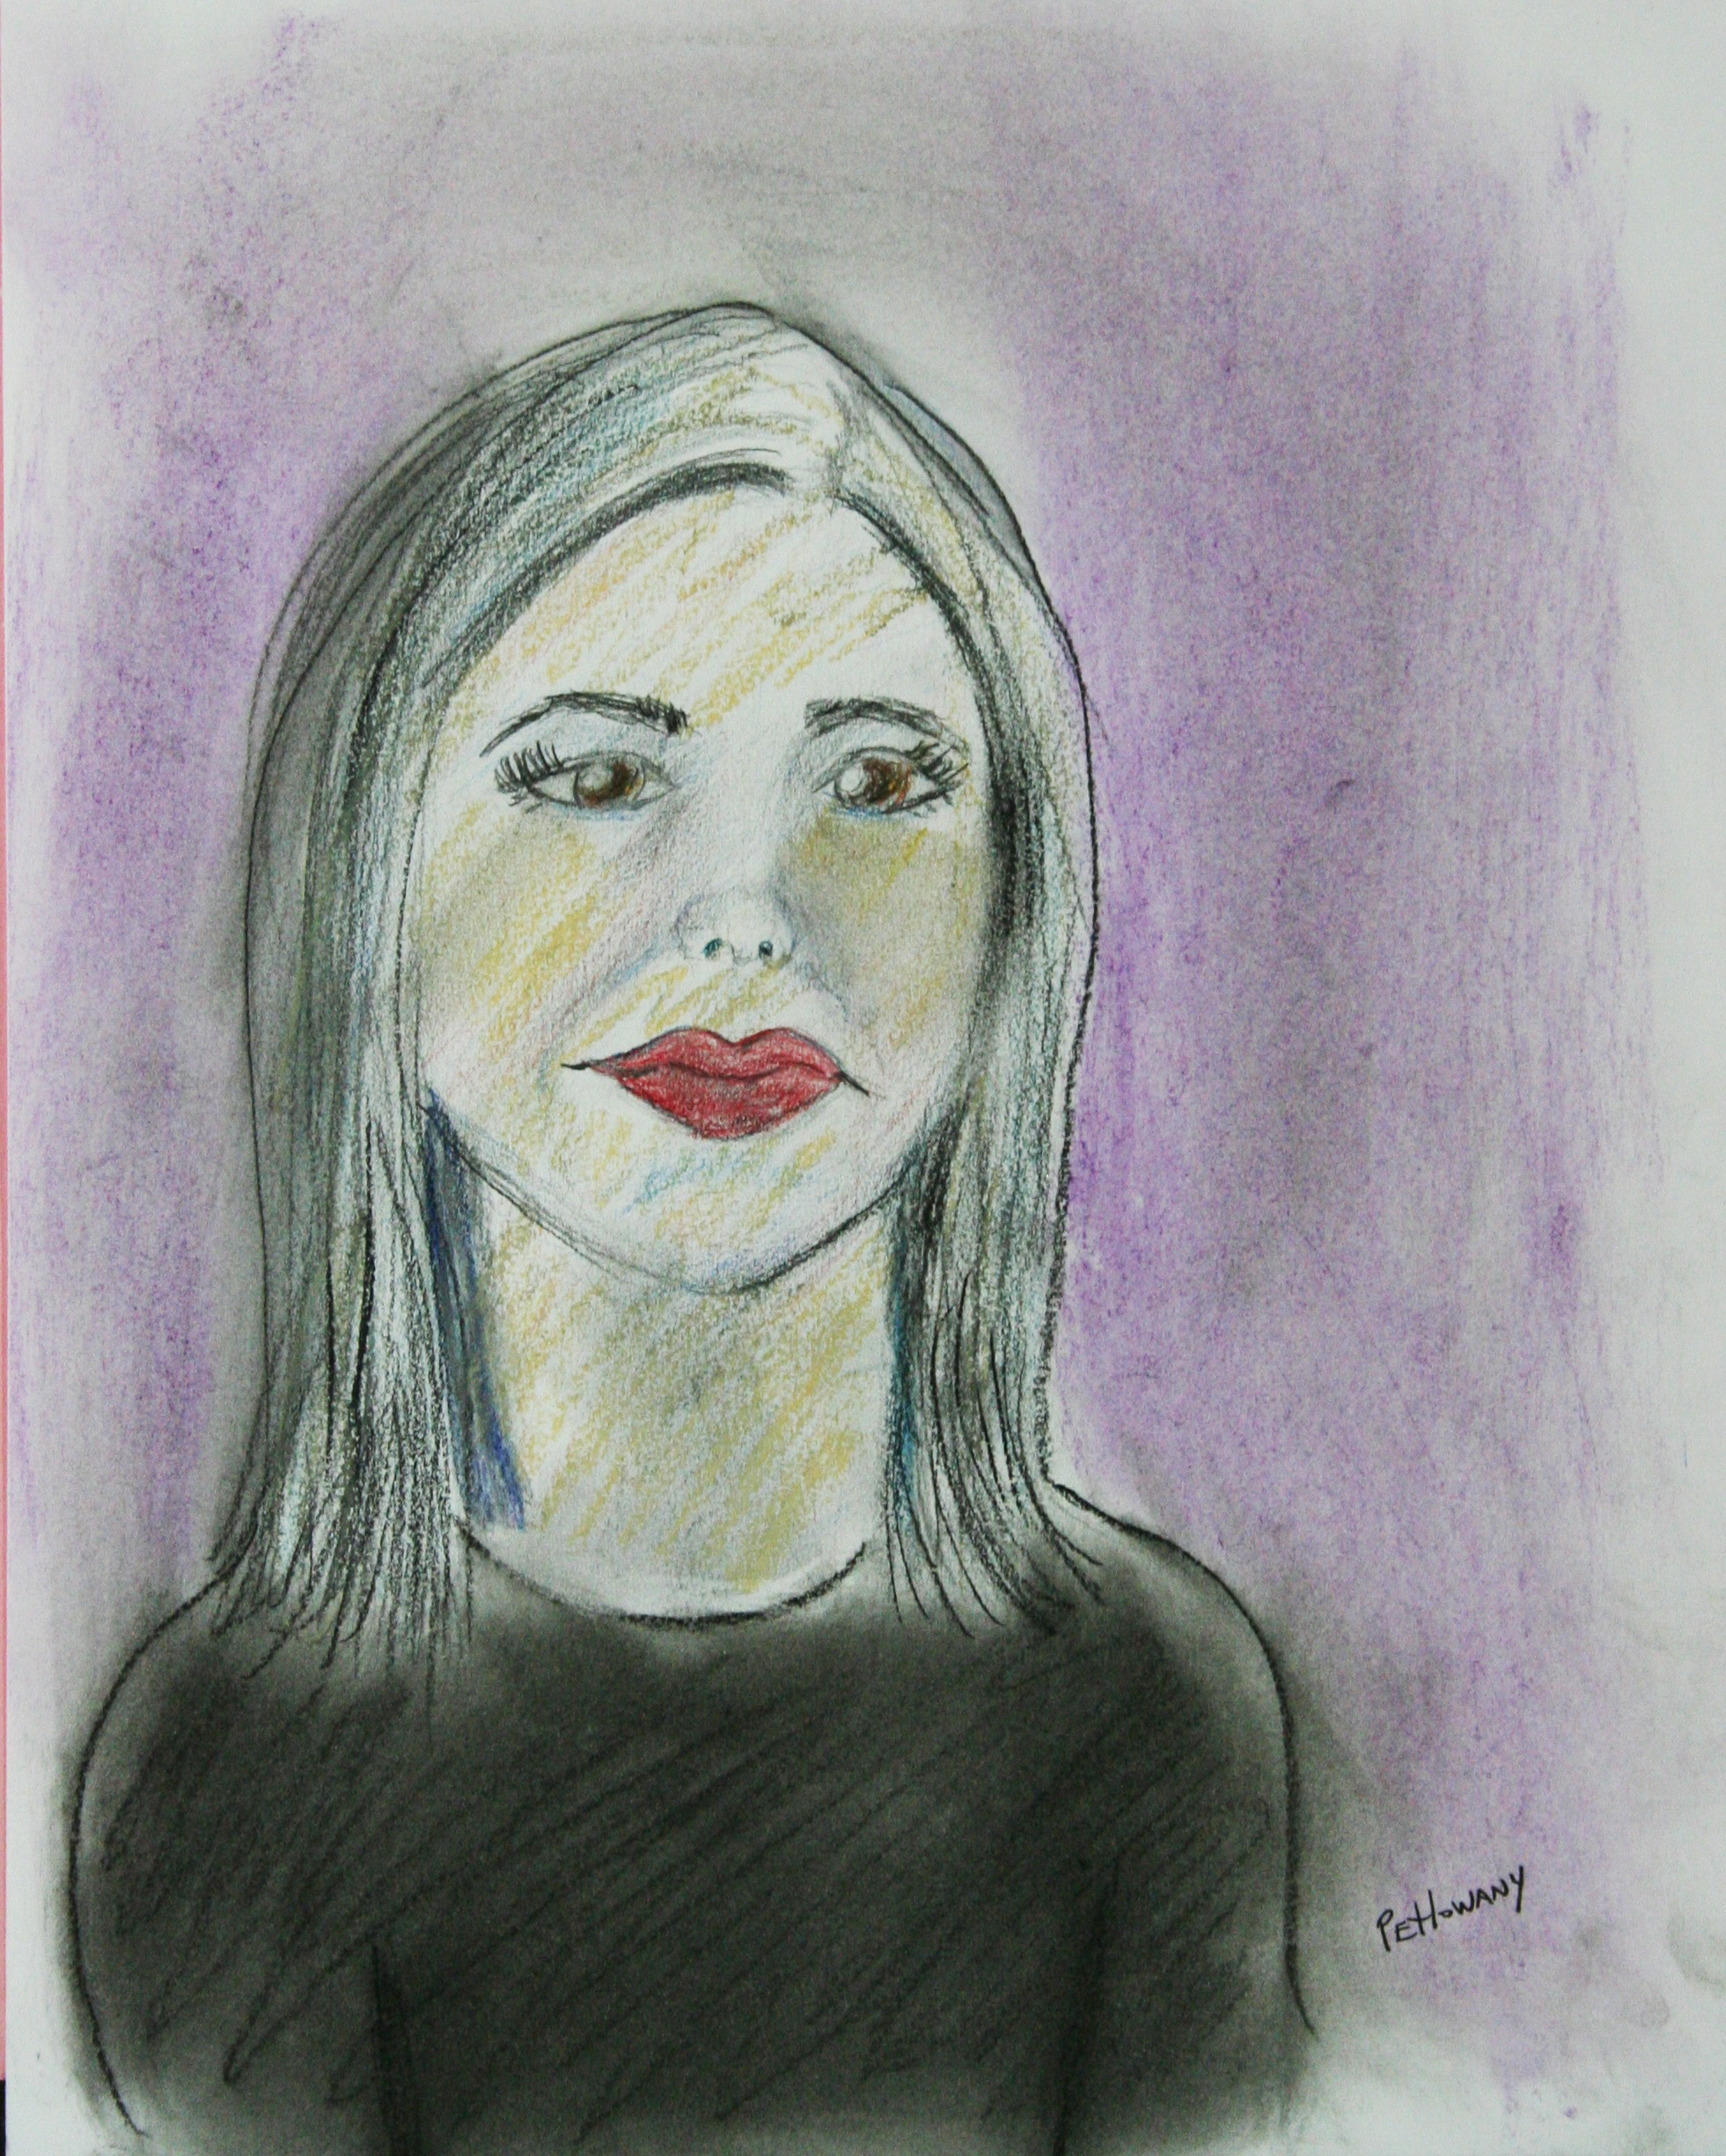 Paula Petlowany did this 2-hour pastel drawing.